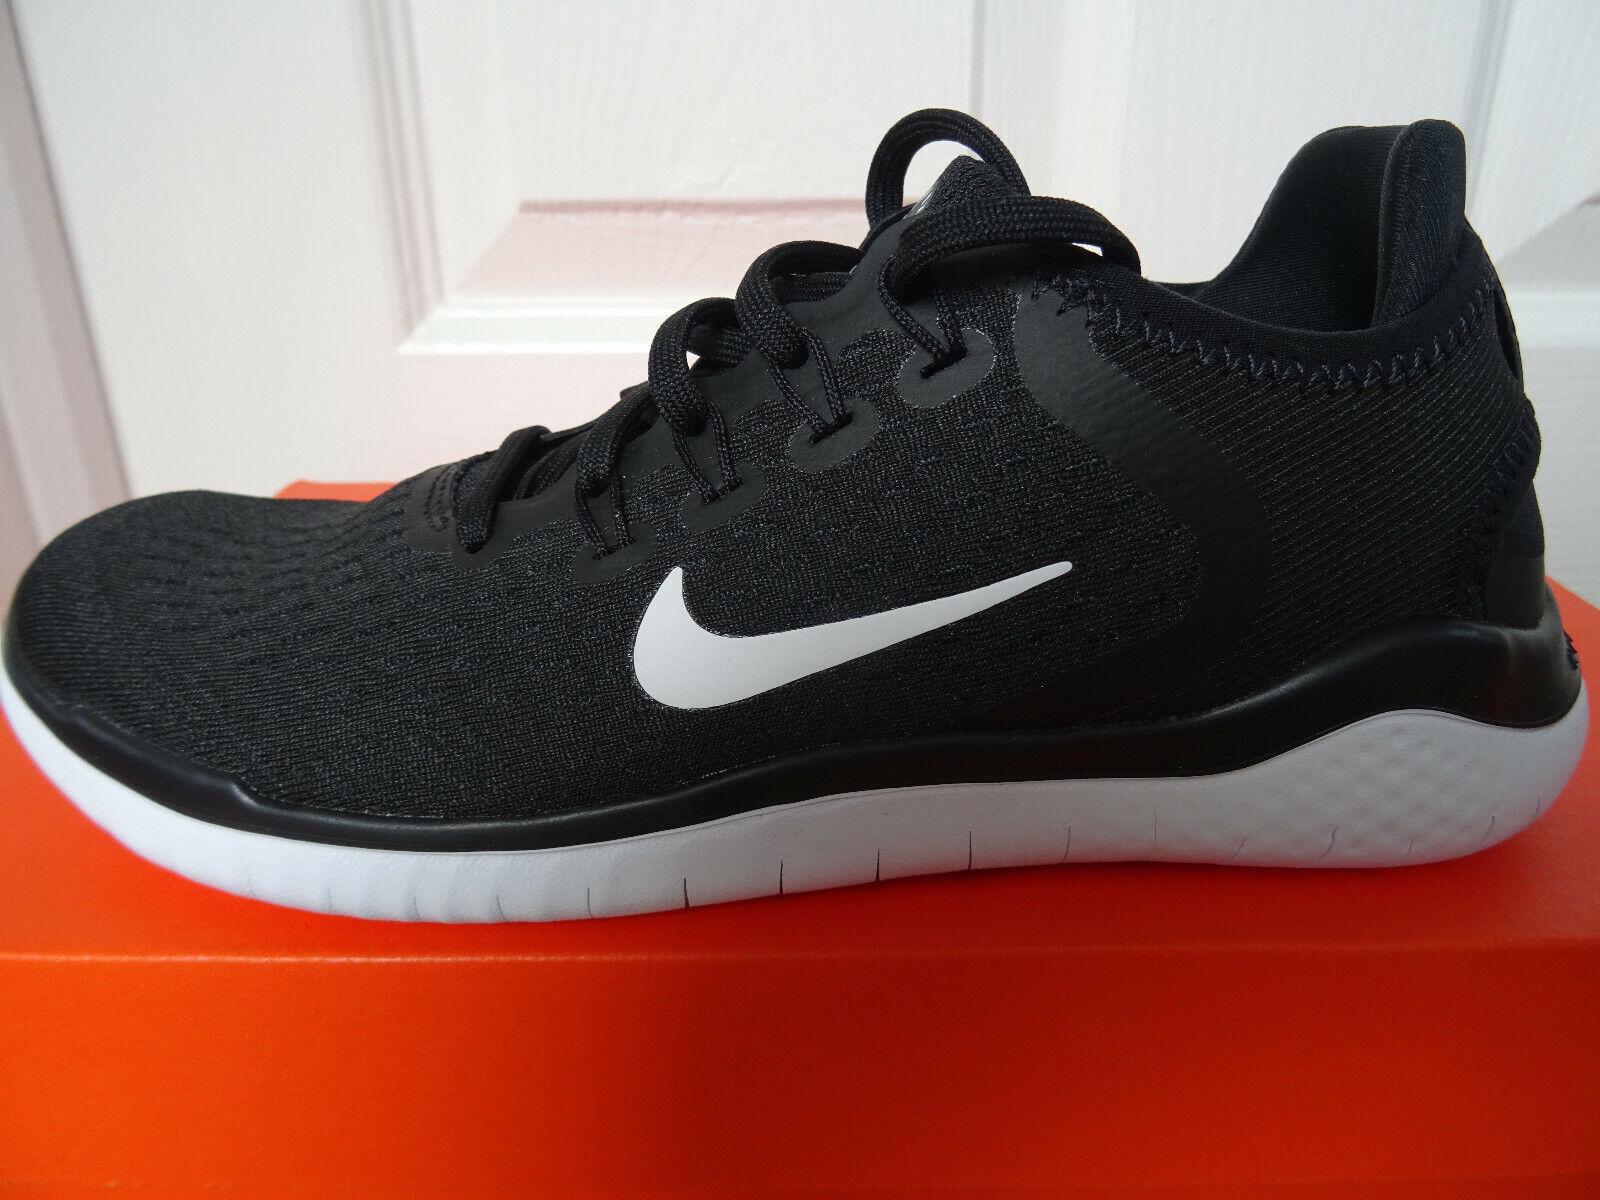 Nike Free Rn Scarpe Da Ginnastica da Donna 2018 942837 001 EU 37.5 US 6.5 Nuovo + Scatola